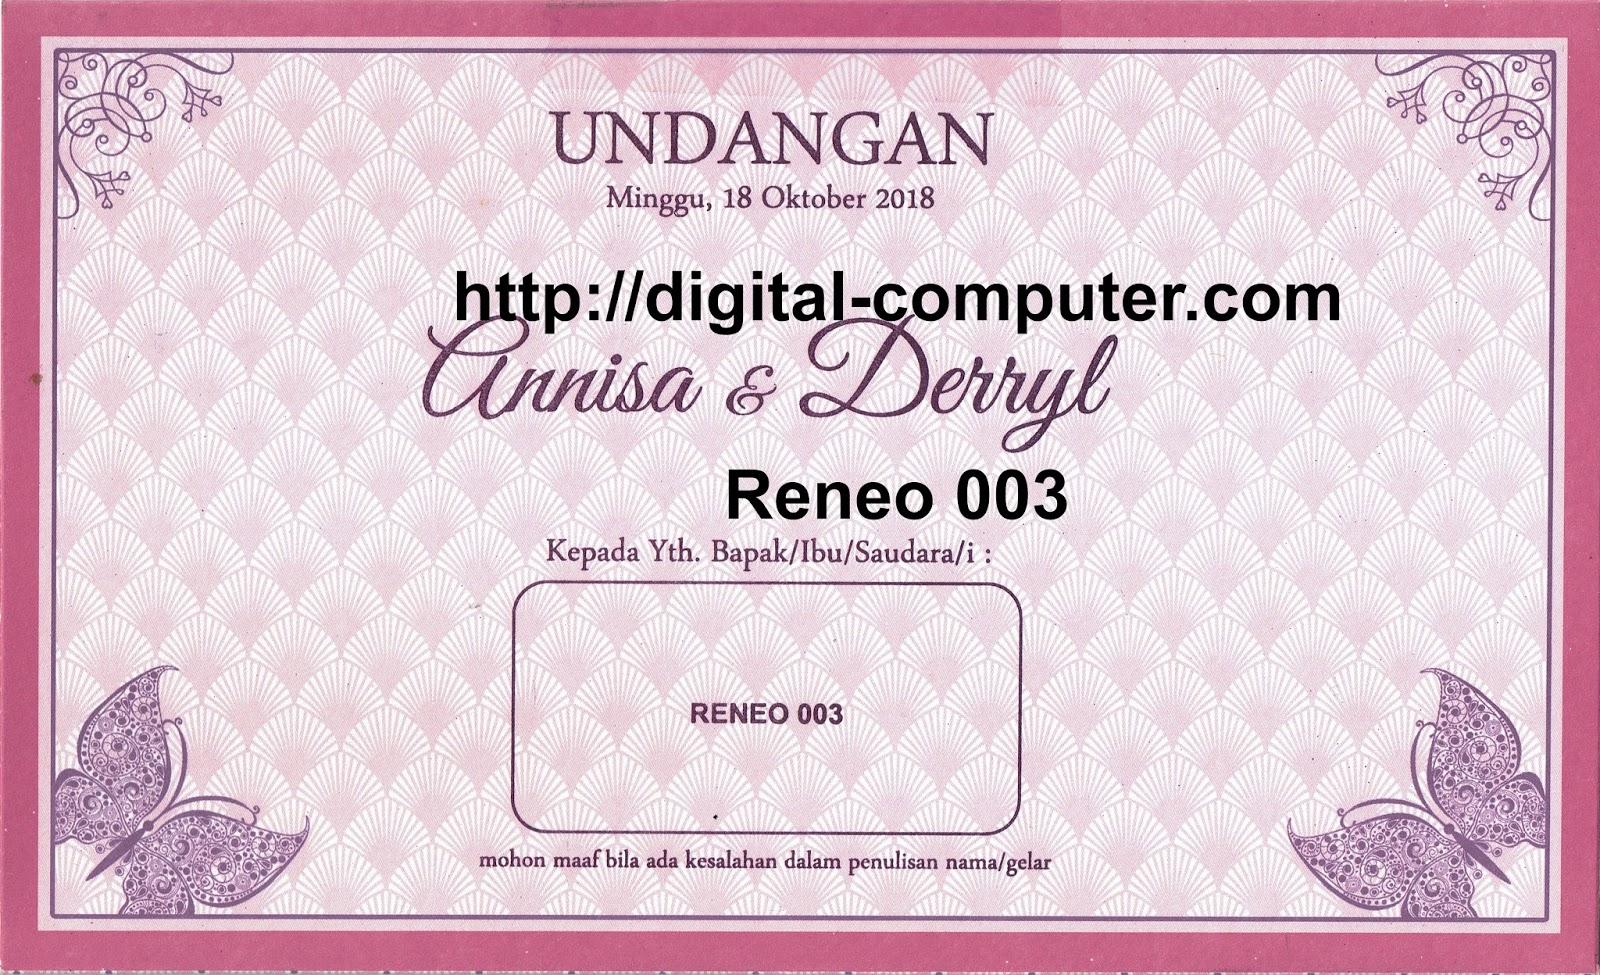 Undangan Softcover Reneo 003